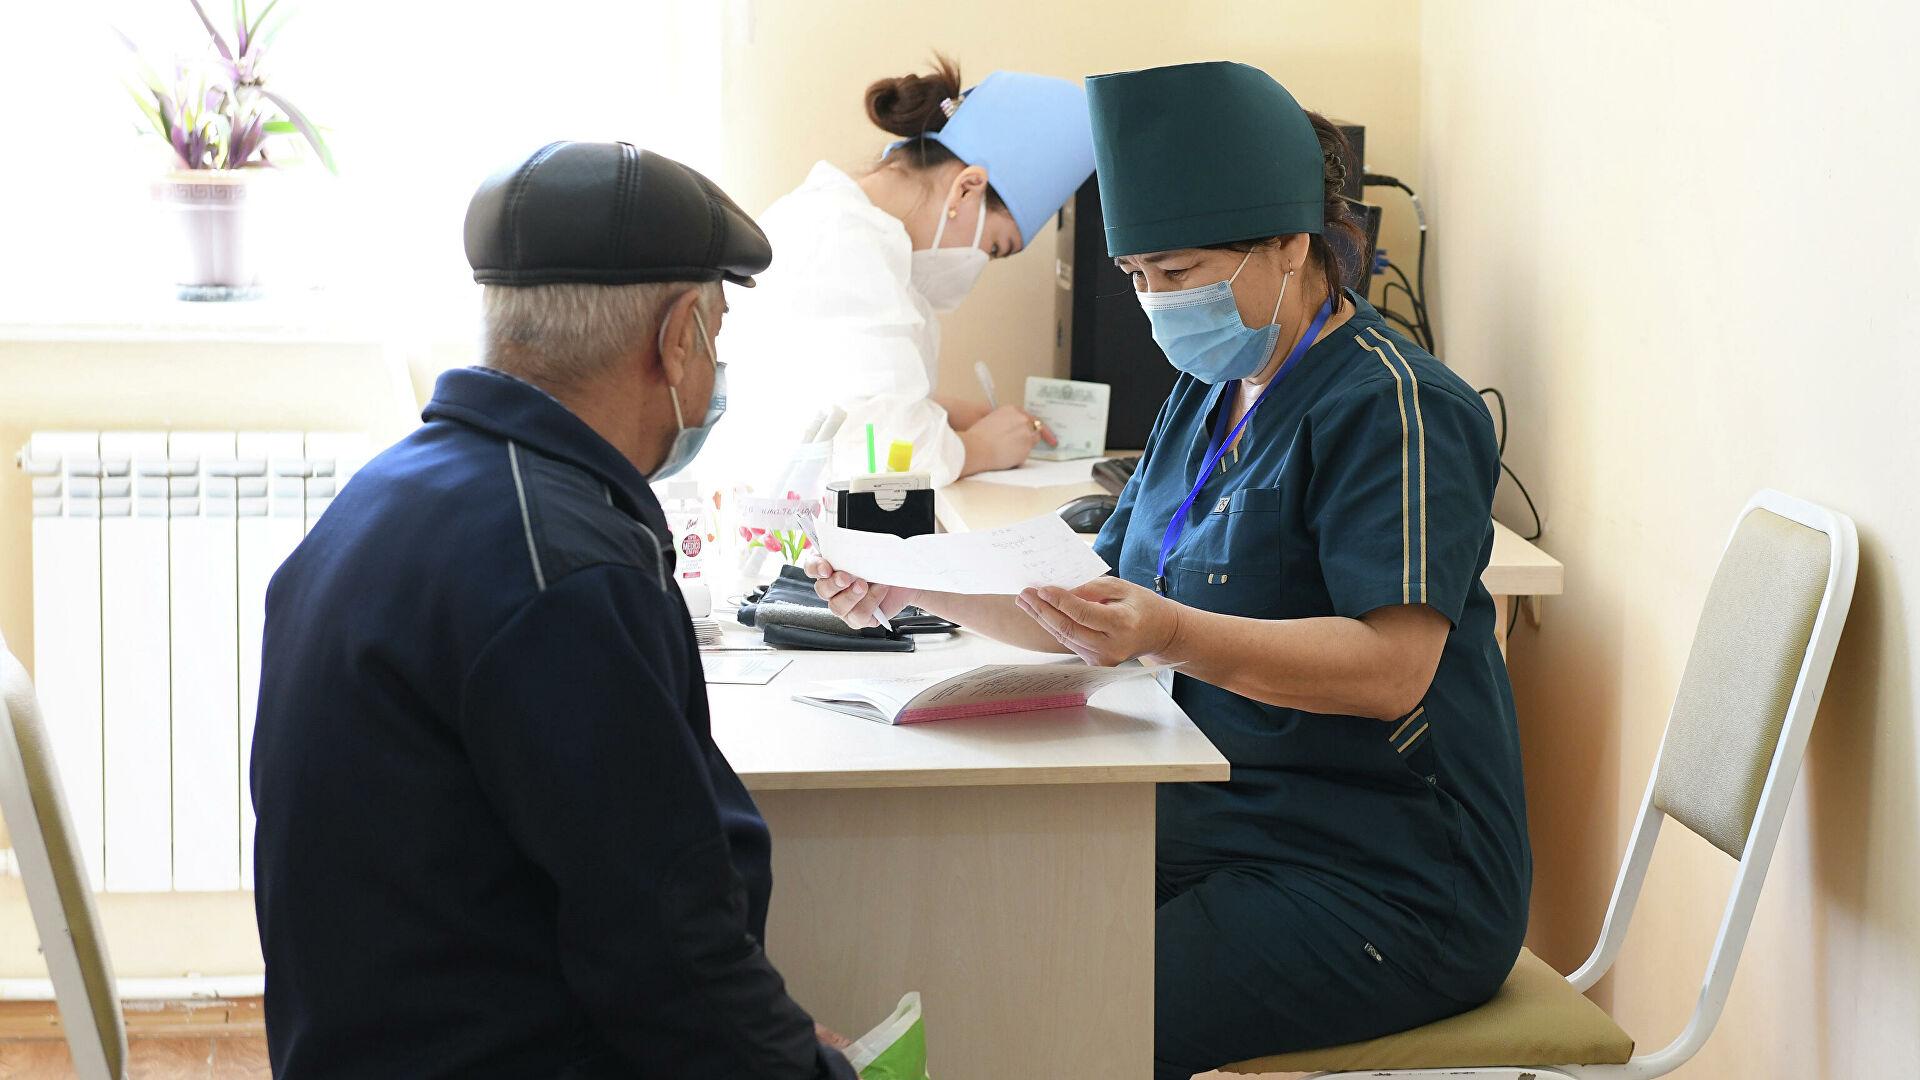 За сутки более 200 тысяч узбекистанцев привились от коронавируса — статистика